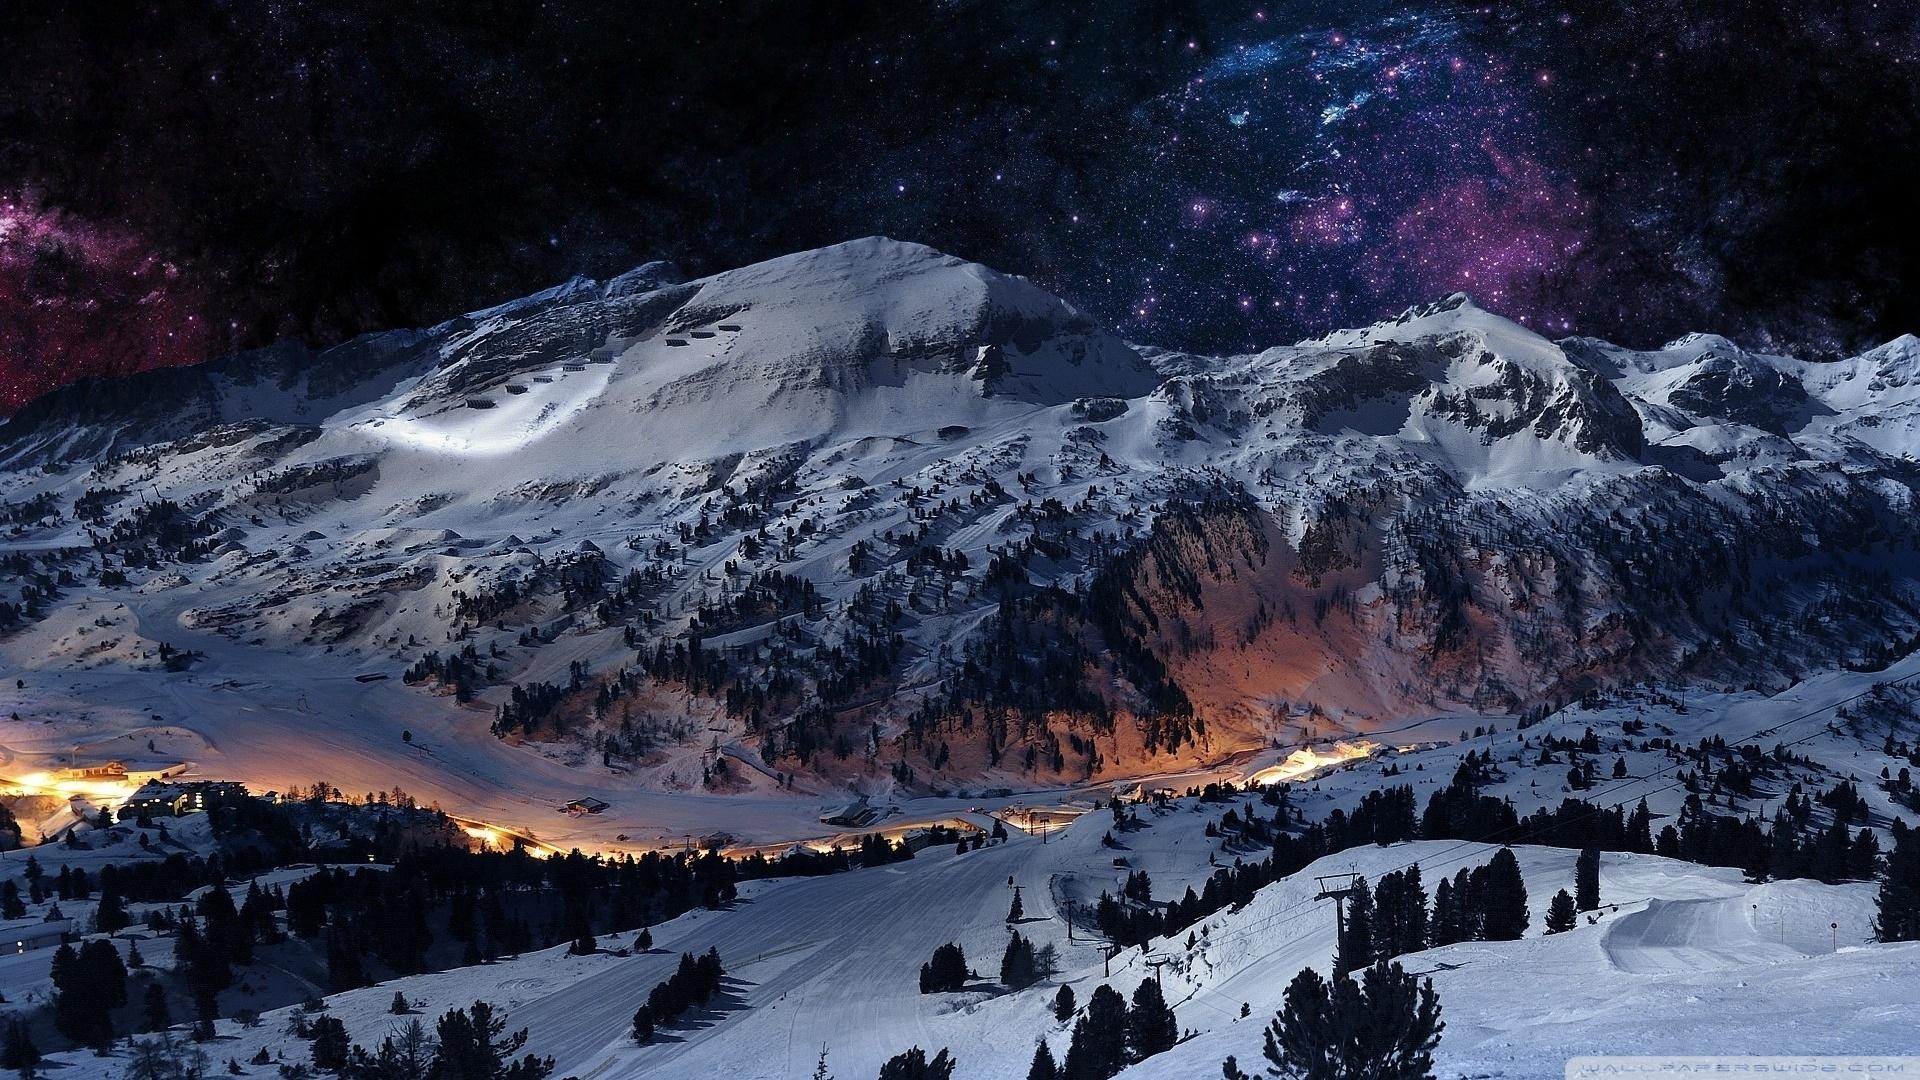 night sky snow ❤ 4k hd desktop wallpaper for 4k ultra hd tv